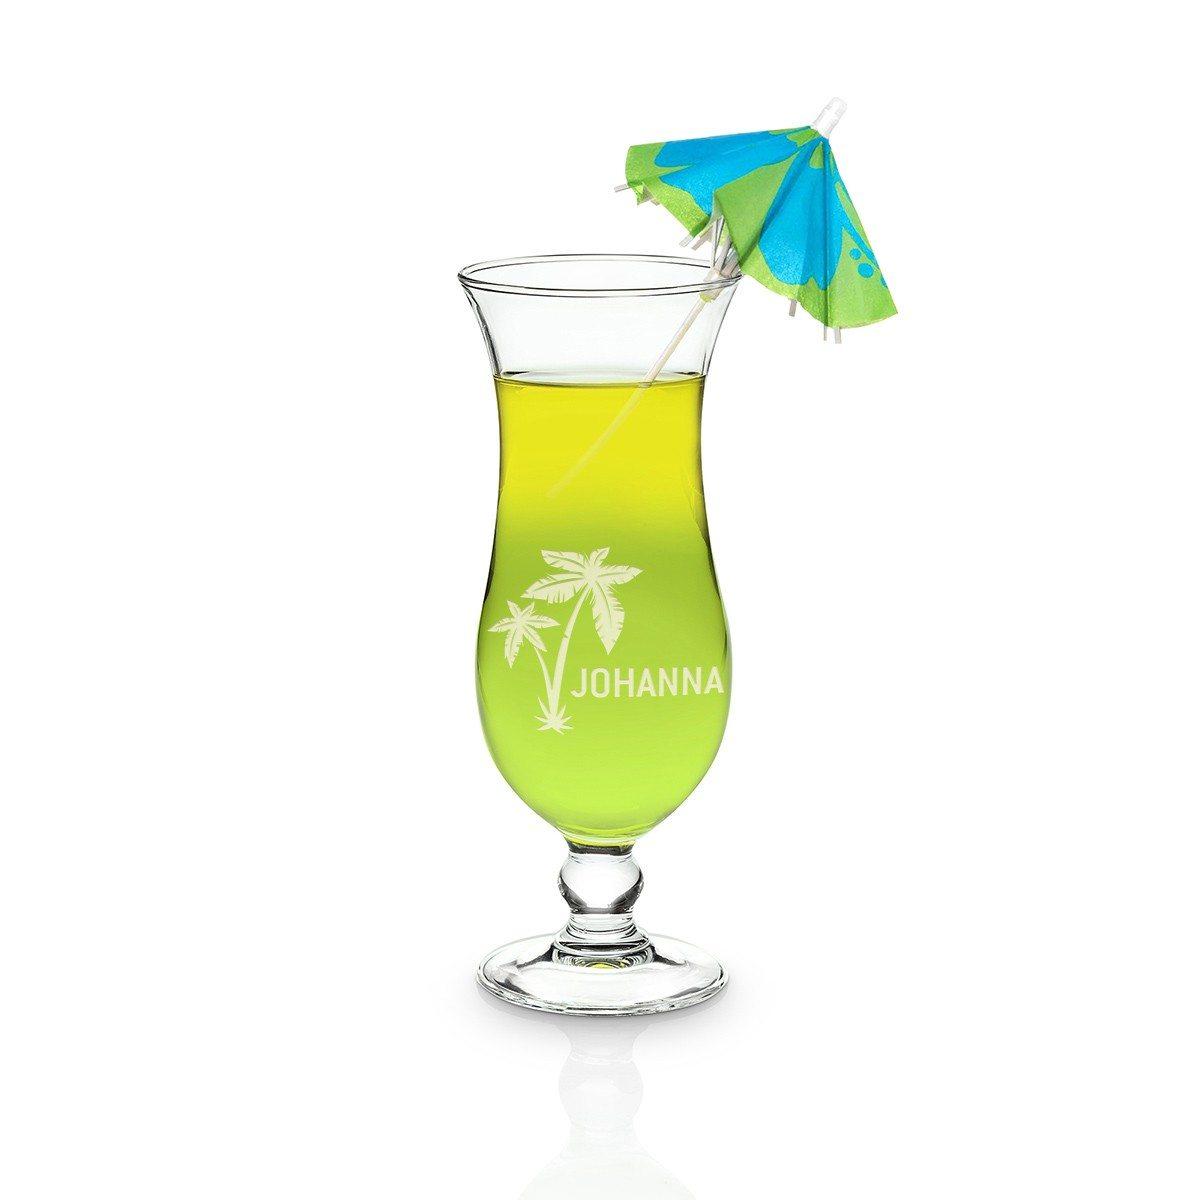 Hurricane cocktailglas met gravure